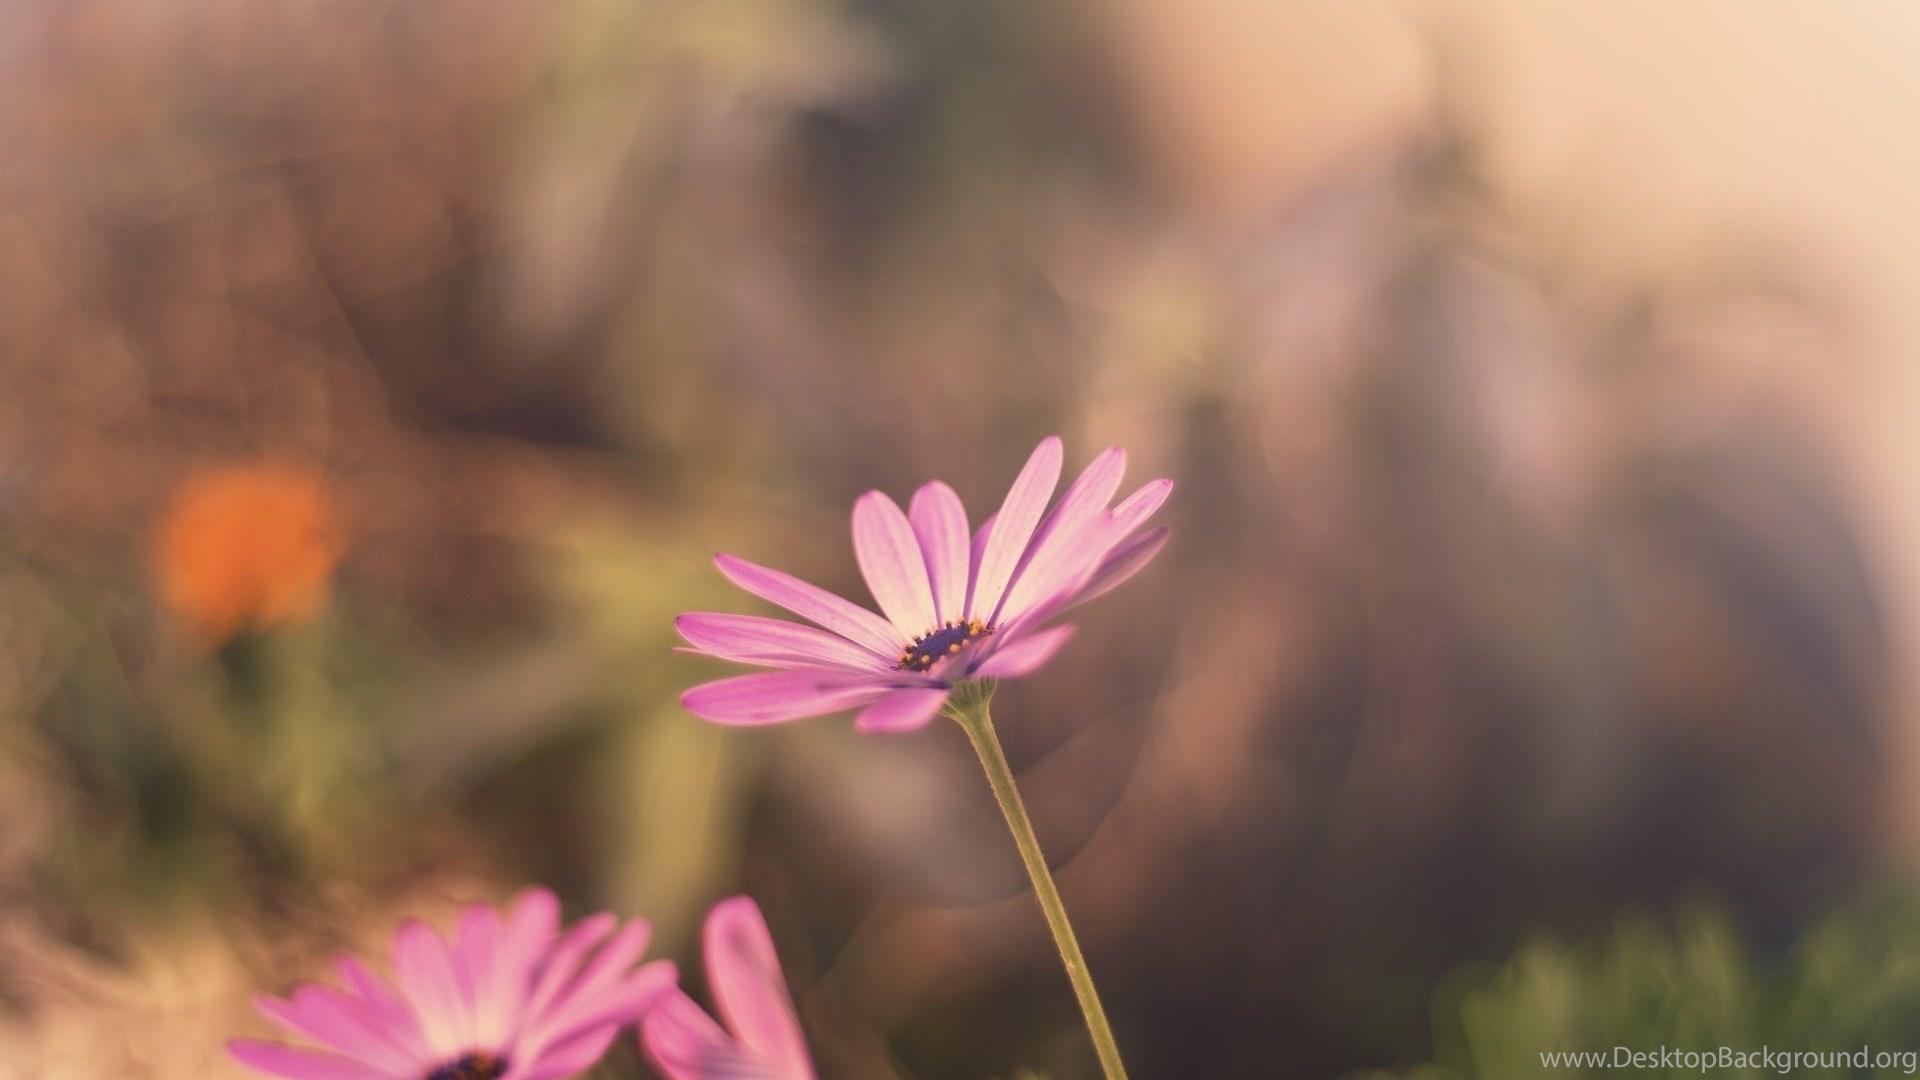 Pastel Flowers Blur Backgrounds Wallpapers Hd Download Desktop